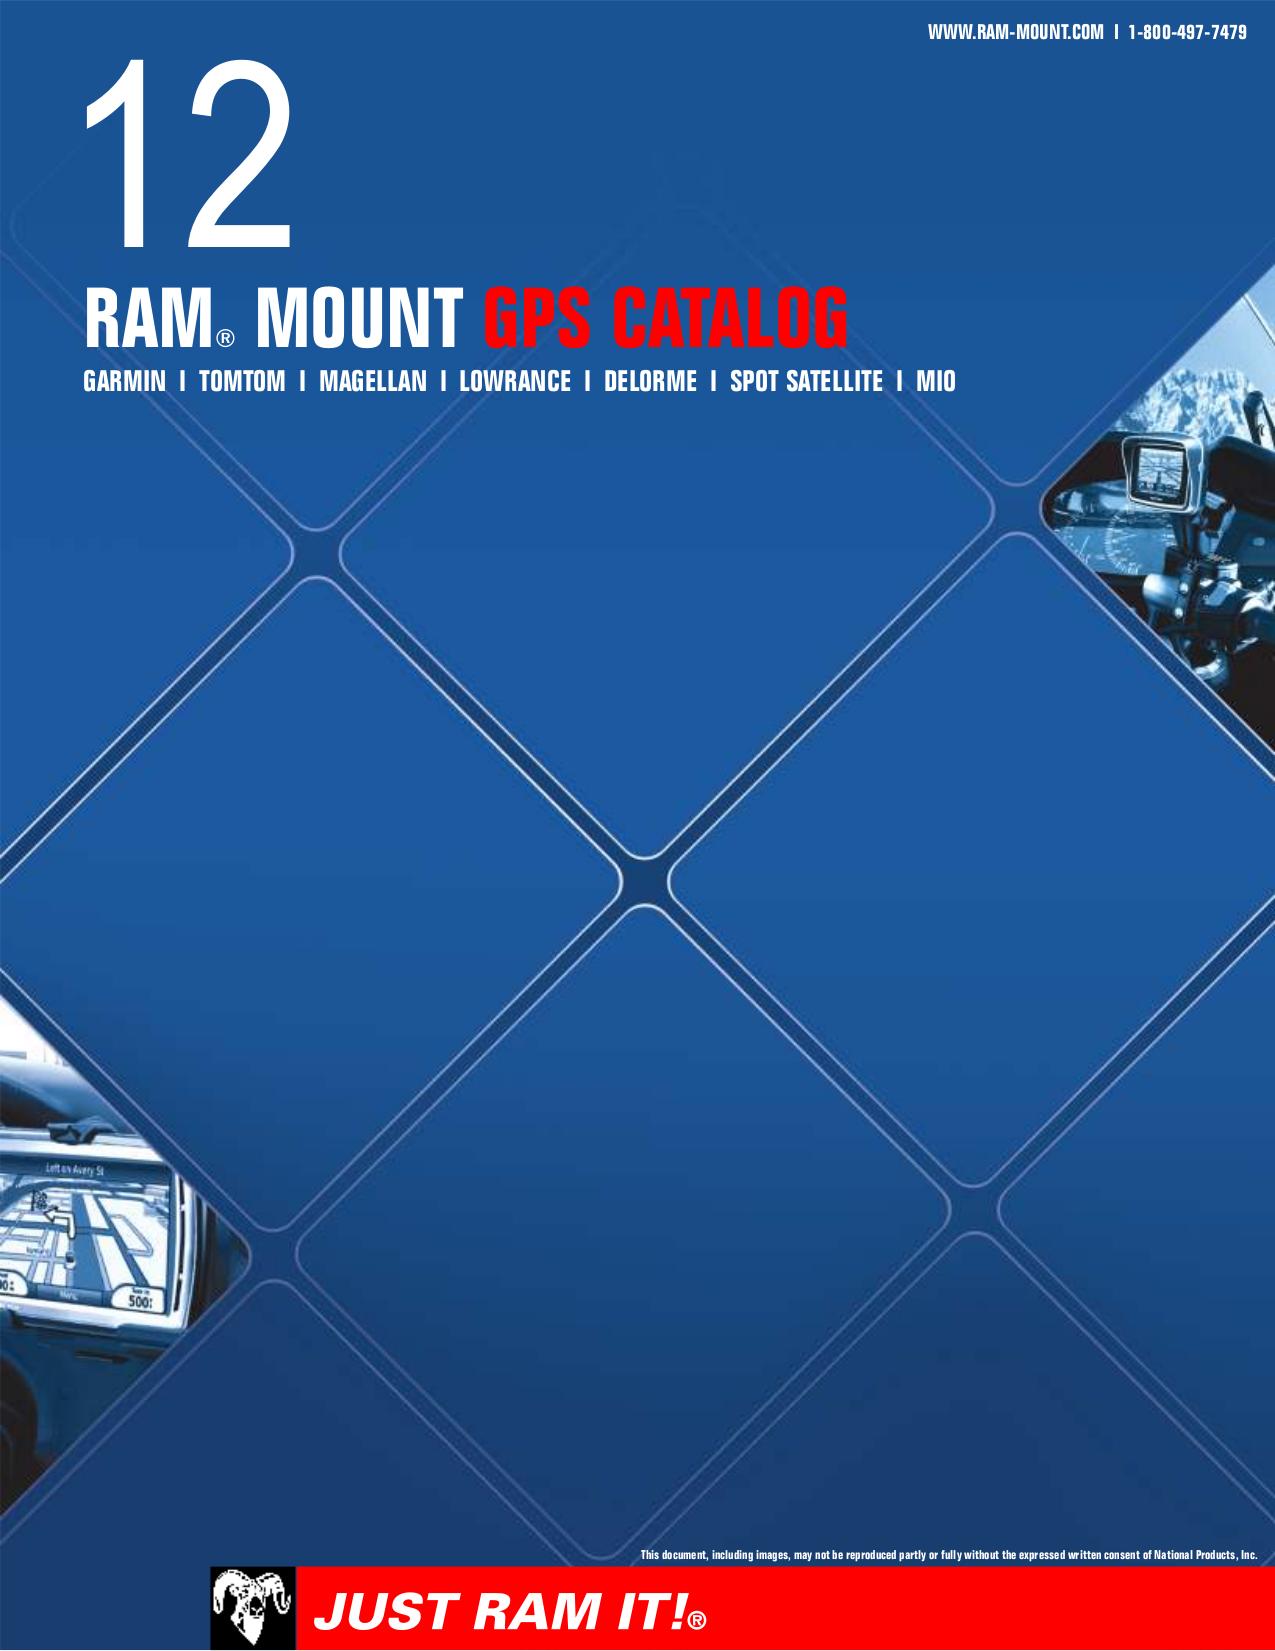 pdf for Lowrance GPS RAM manual